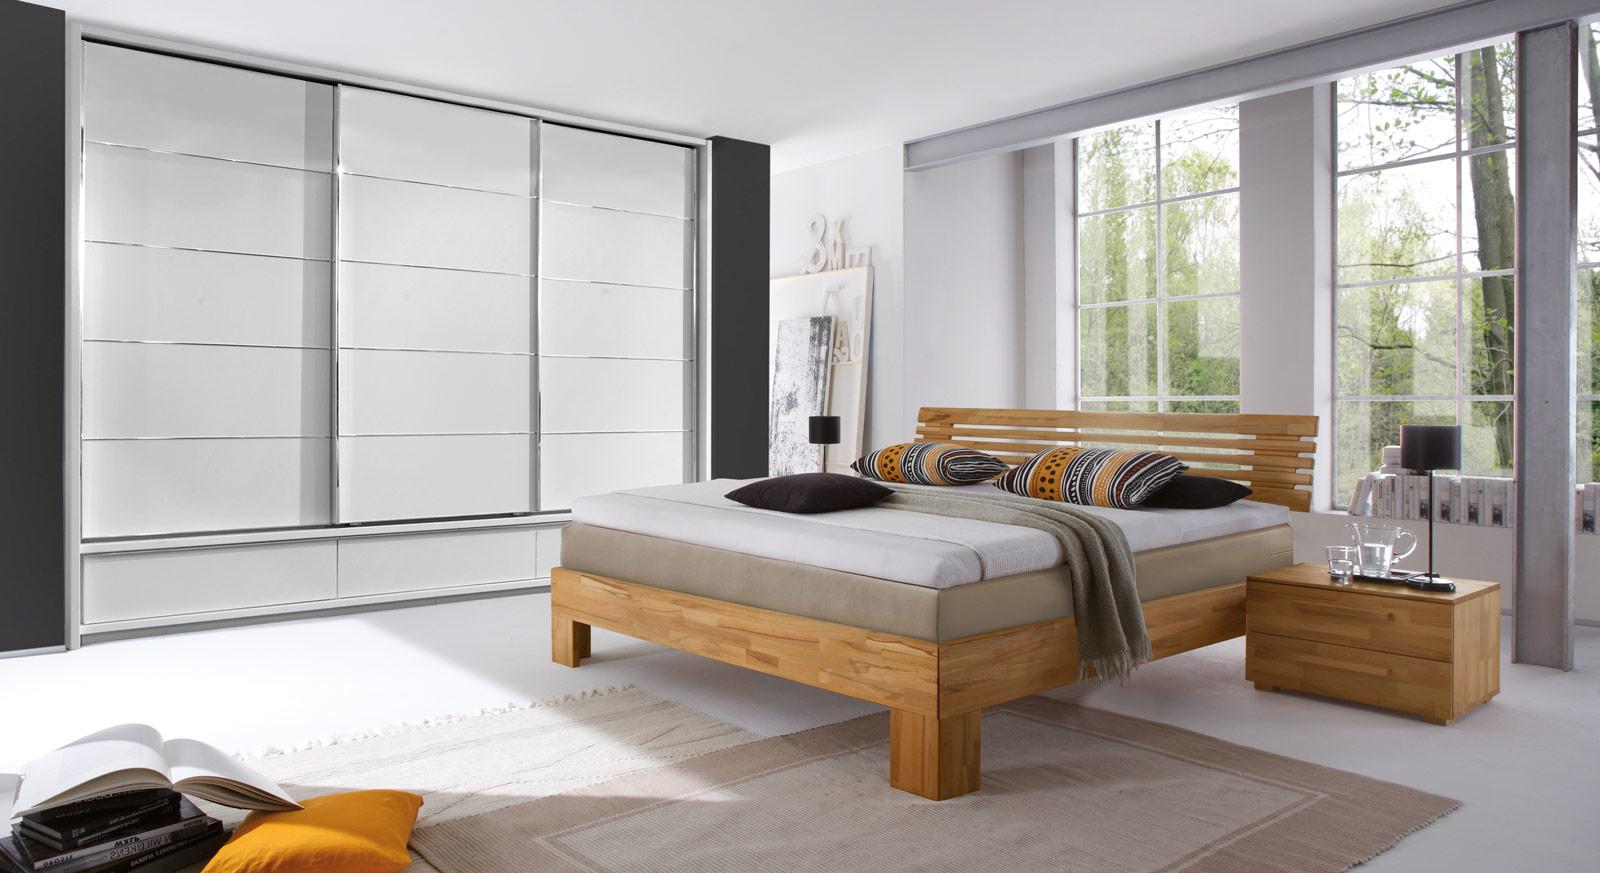 nachttisch boxspringbett buche inspiration ber haus design. Black Bedroom Furniture Sets. Home Design Ideas